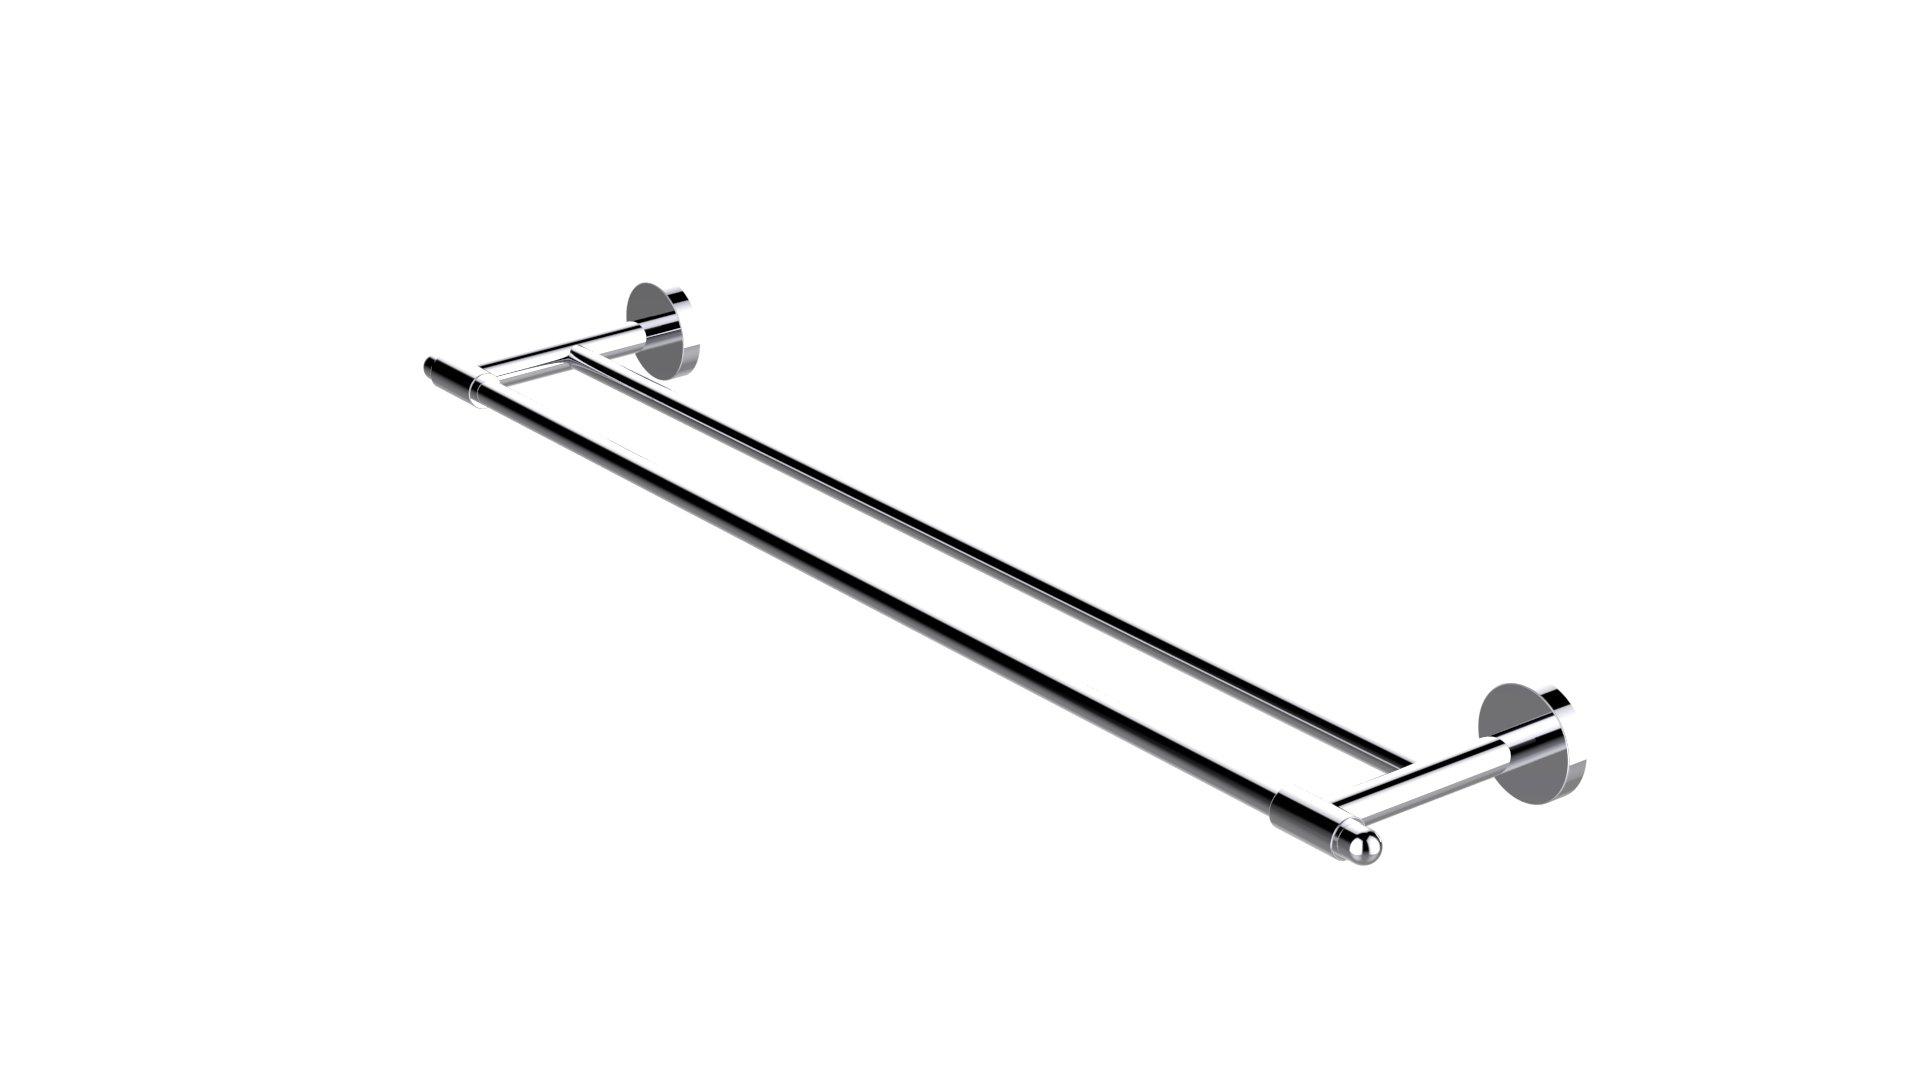 Eviva EVAC022BN Bullet Double Towel Bar Round Design Bathroom Accessories Combination, Brushed Nickel